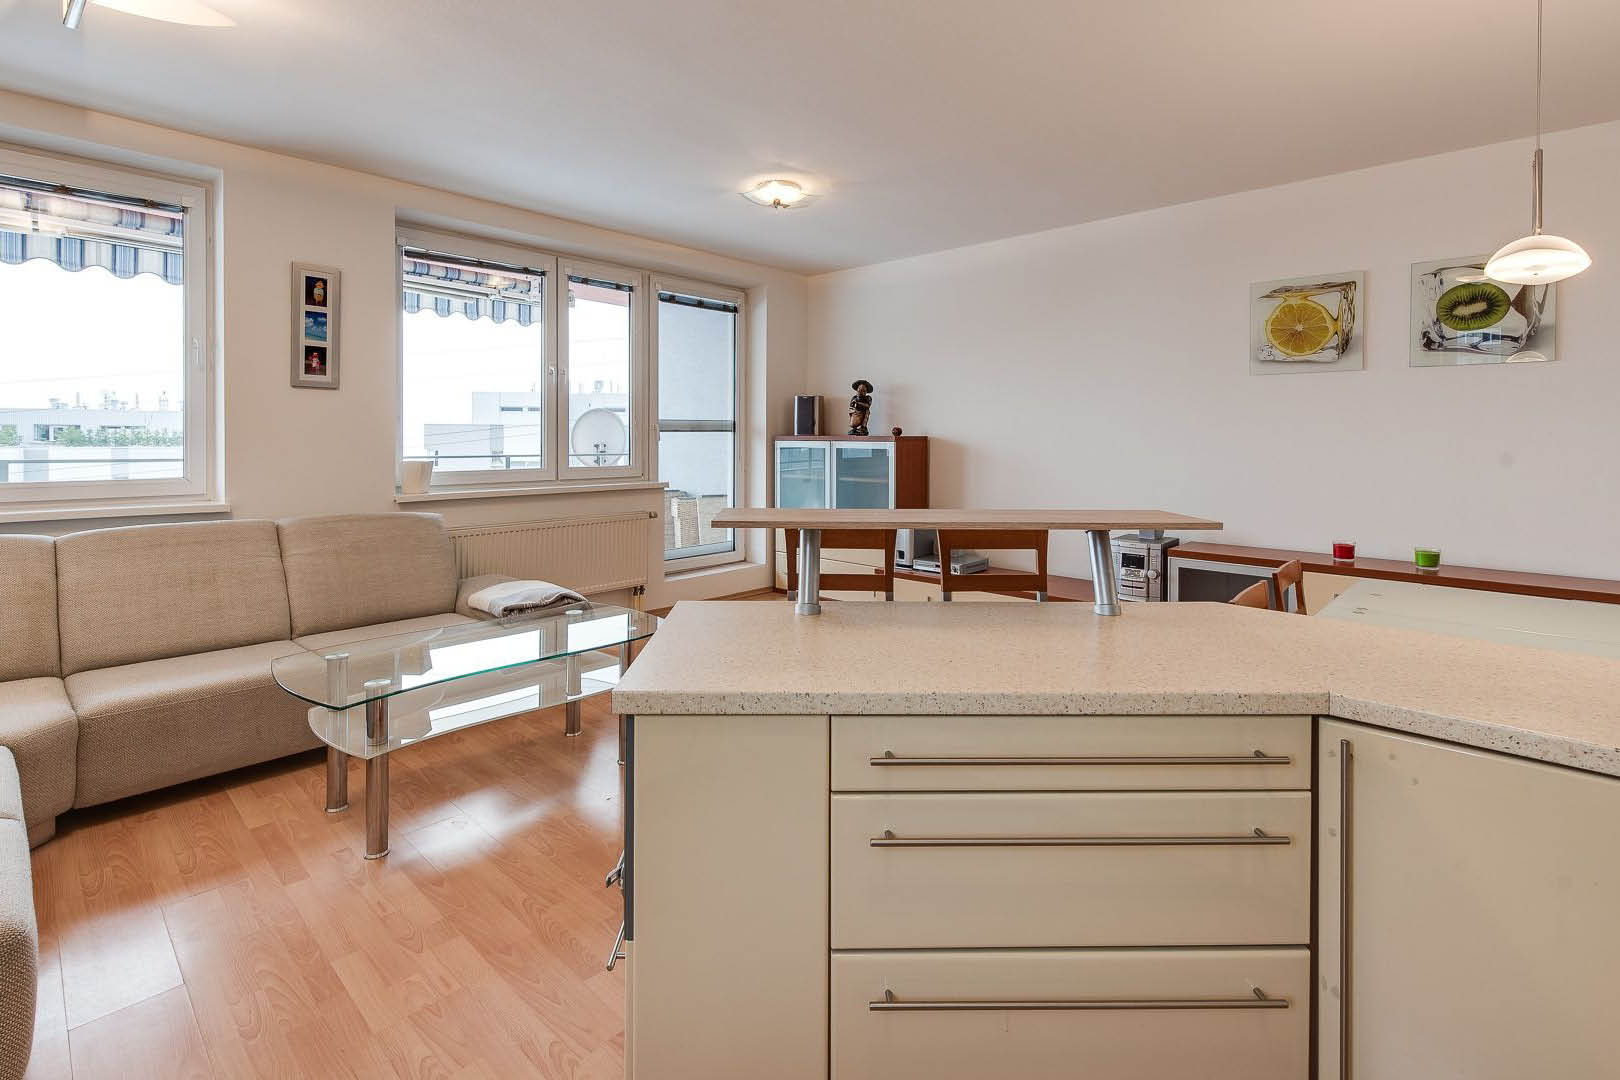 PREDANÉ | 4 izbový byt | Kresánková, Bratislava